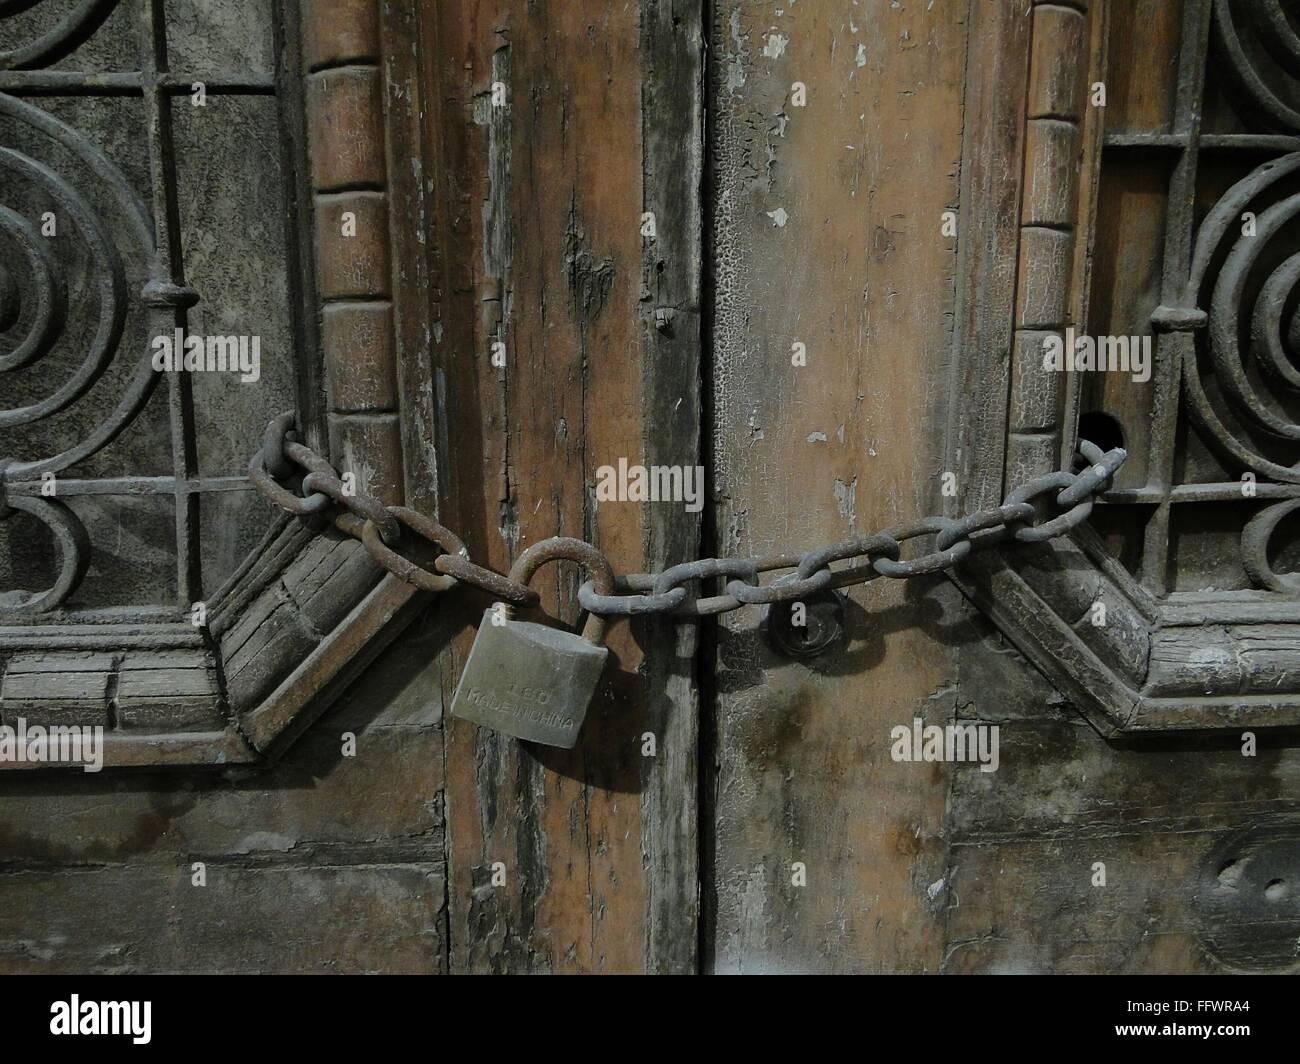 Rusty Chain Lock On Old Wooden Door Stock Photo